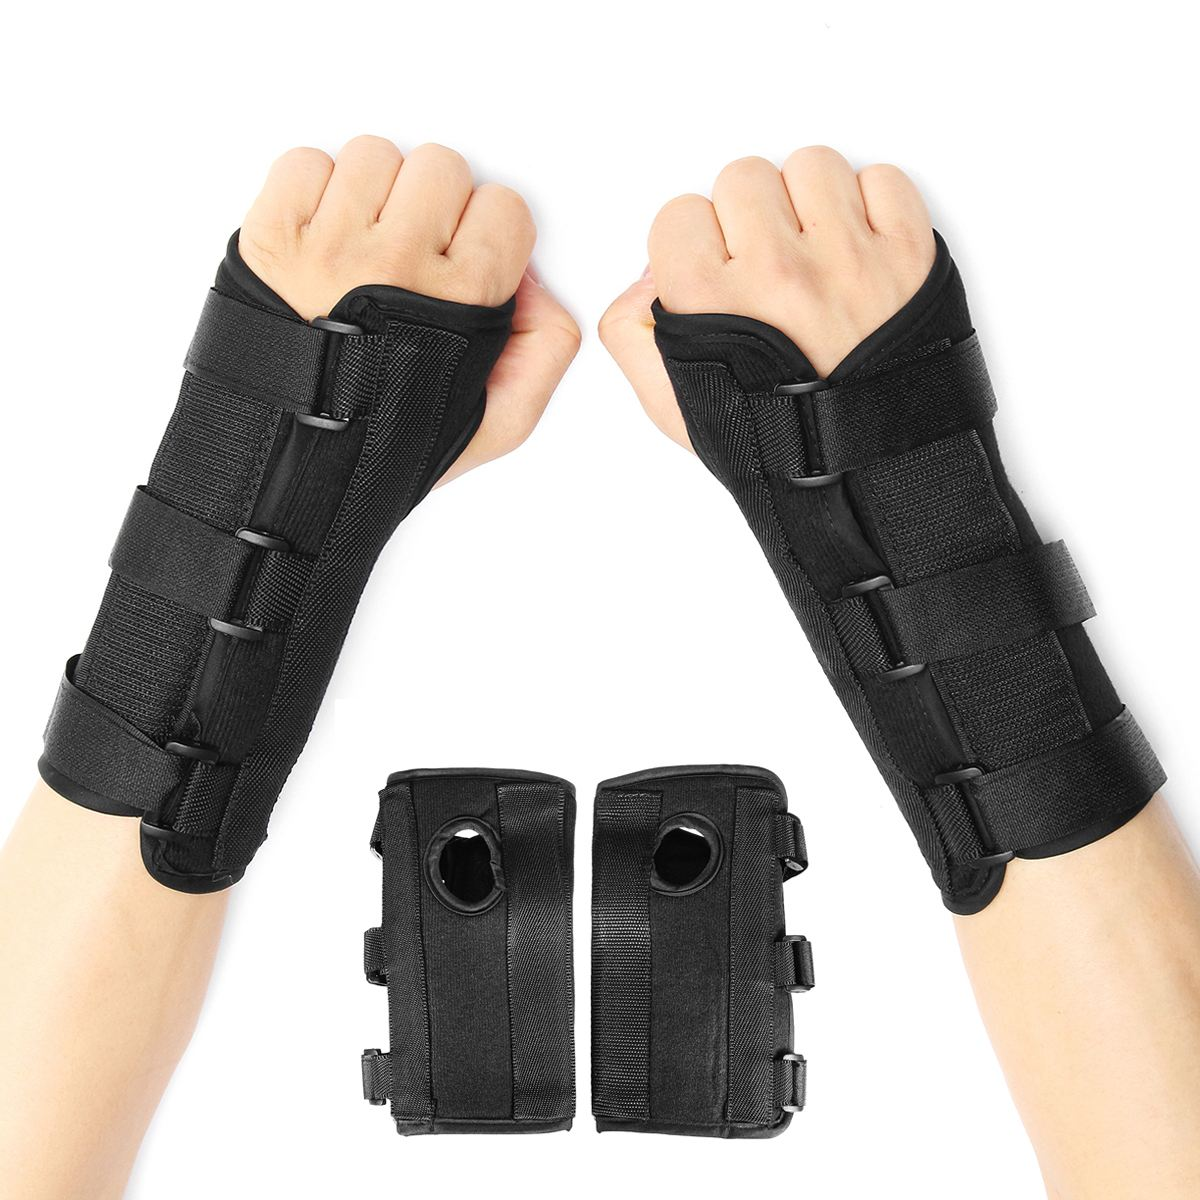 1 Pair Carpal Tunnel Wrist Support Sprain Forearm Splint Orthotic Brace Bandage Belt Sports Wrist Protector Support belt